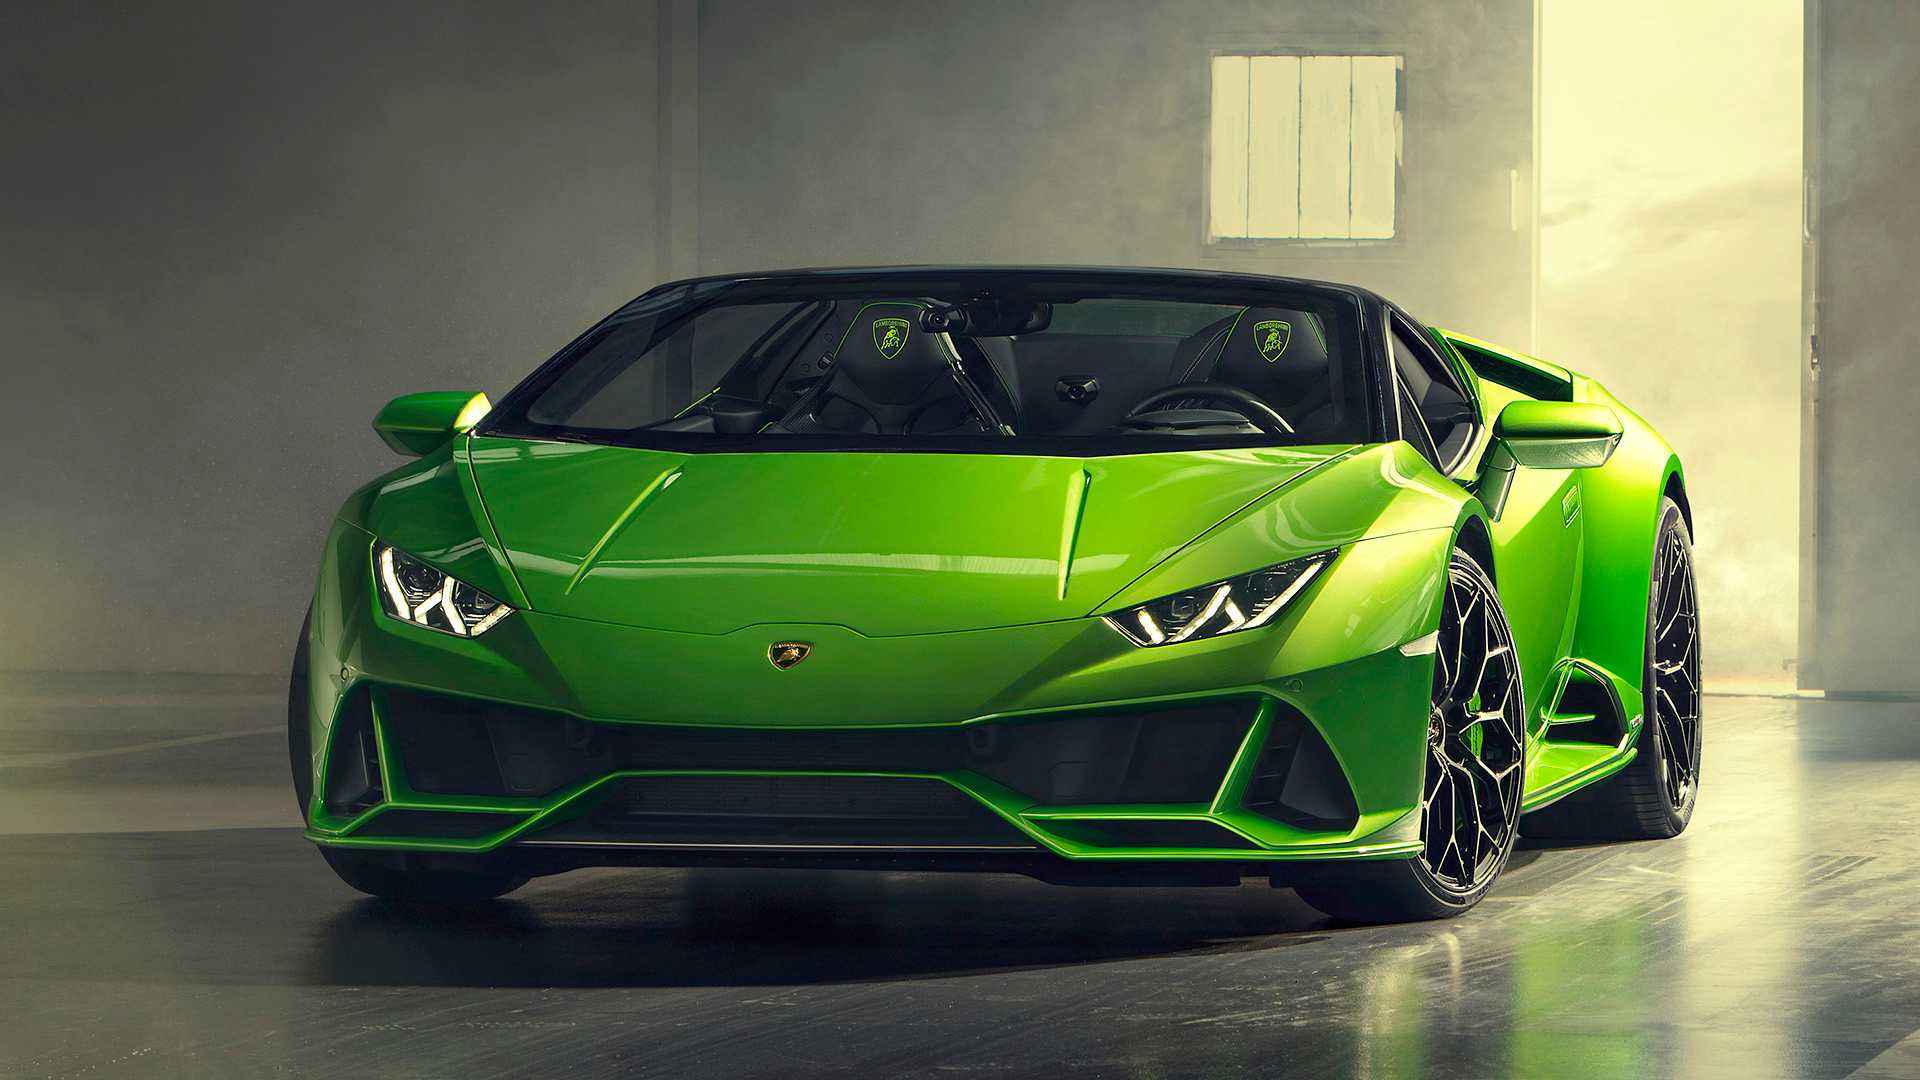 The Lamborghini Huracan Evo Spyder Is Pure Filth Carsaar